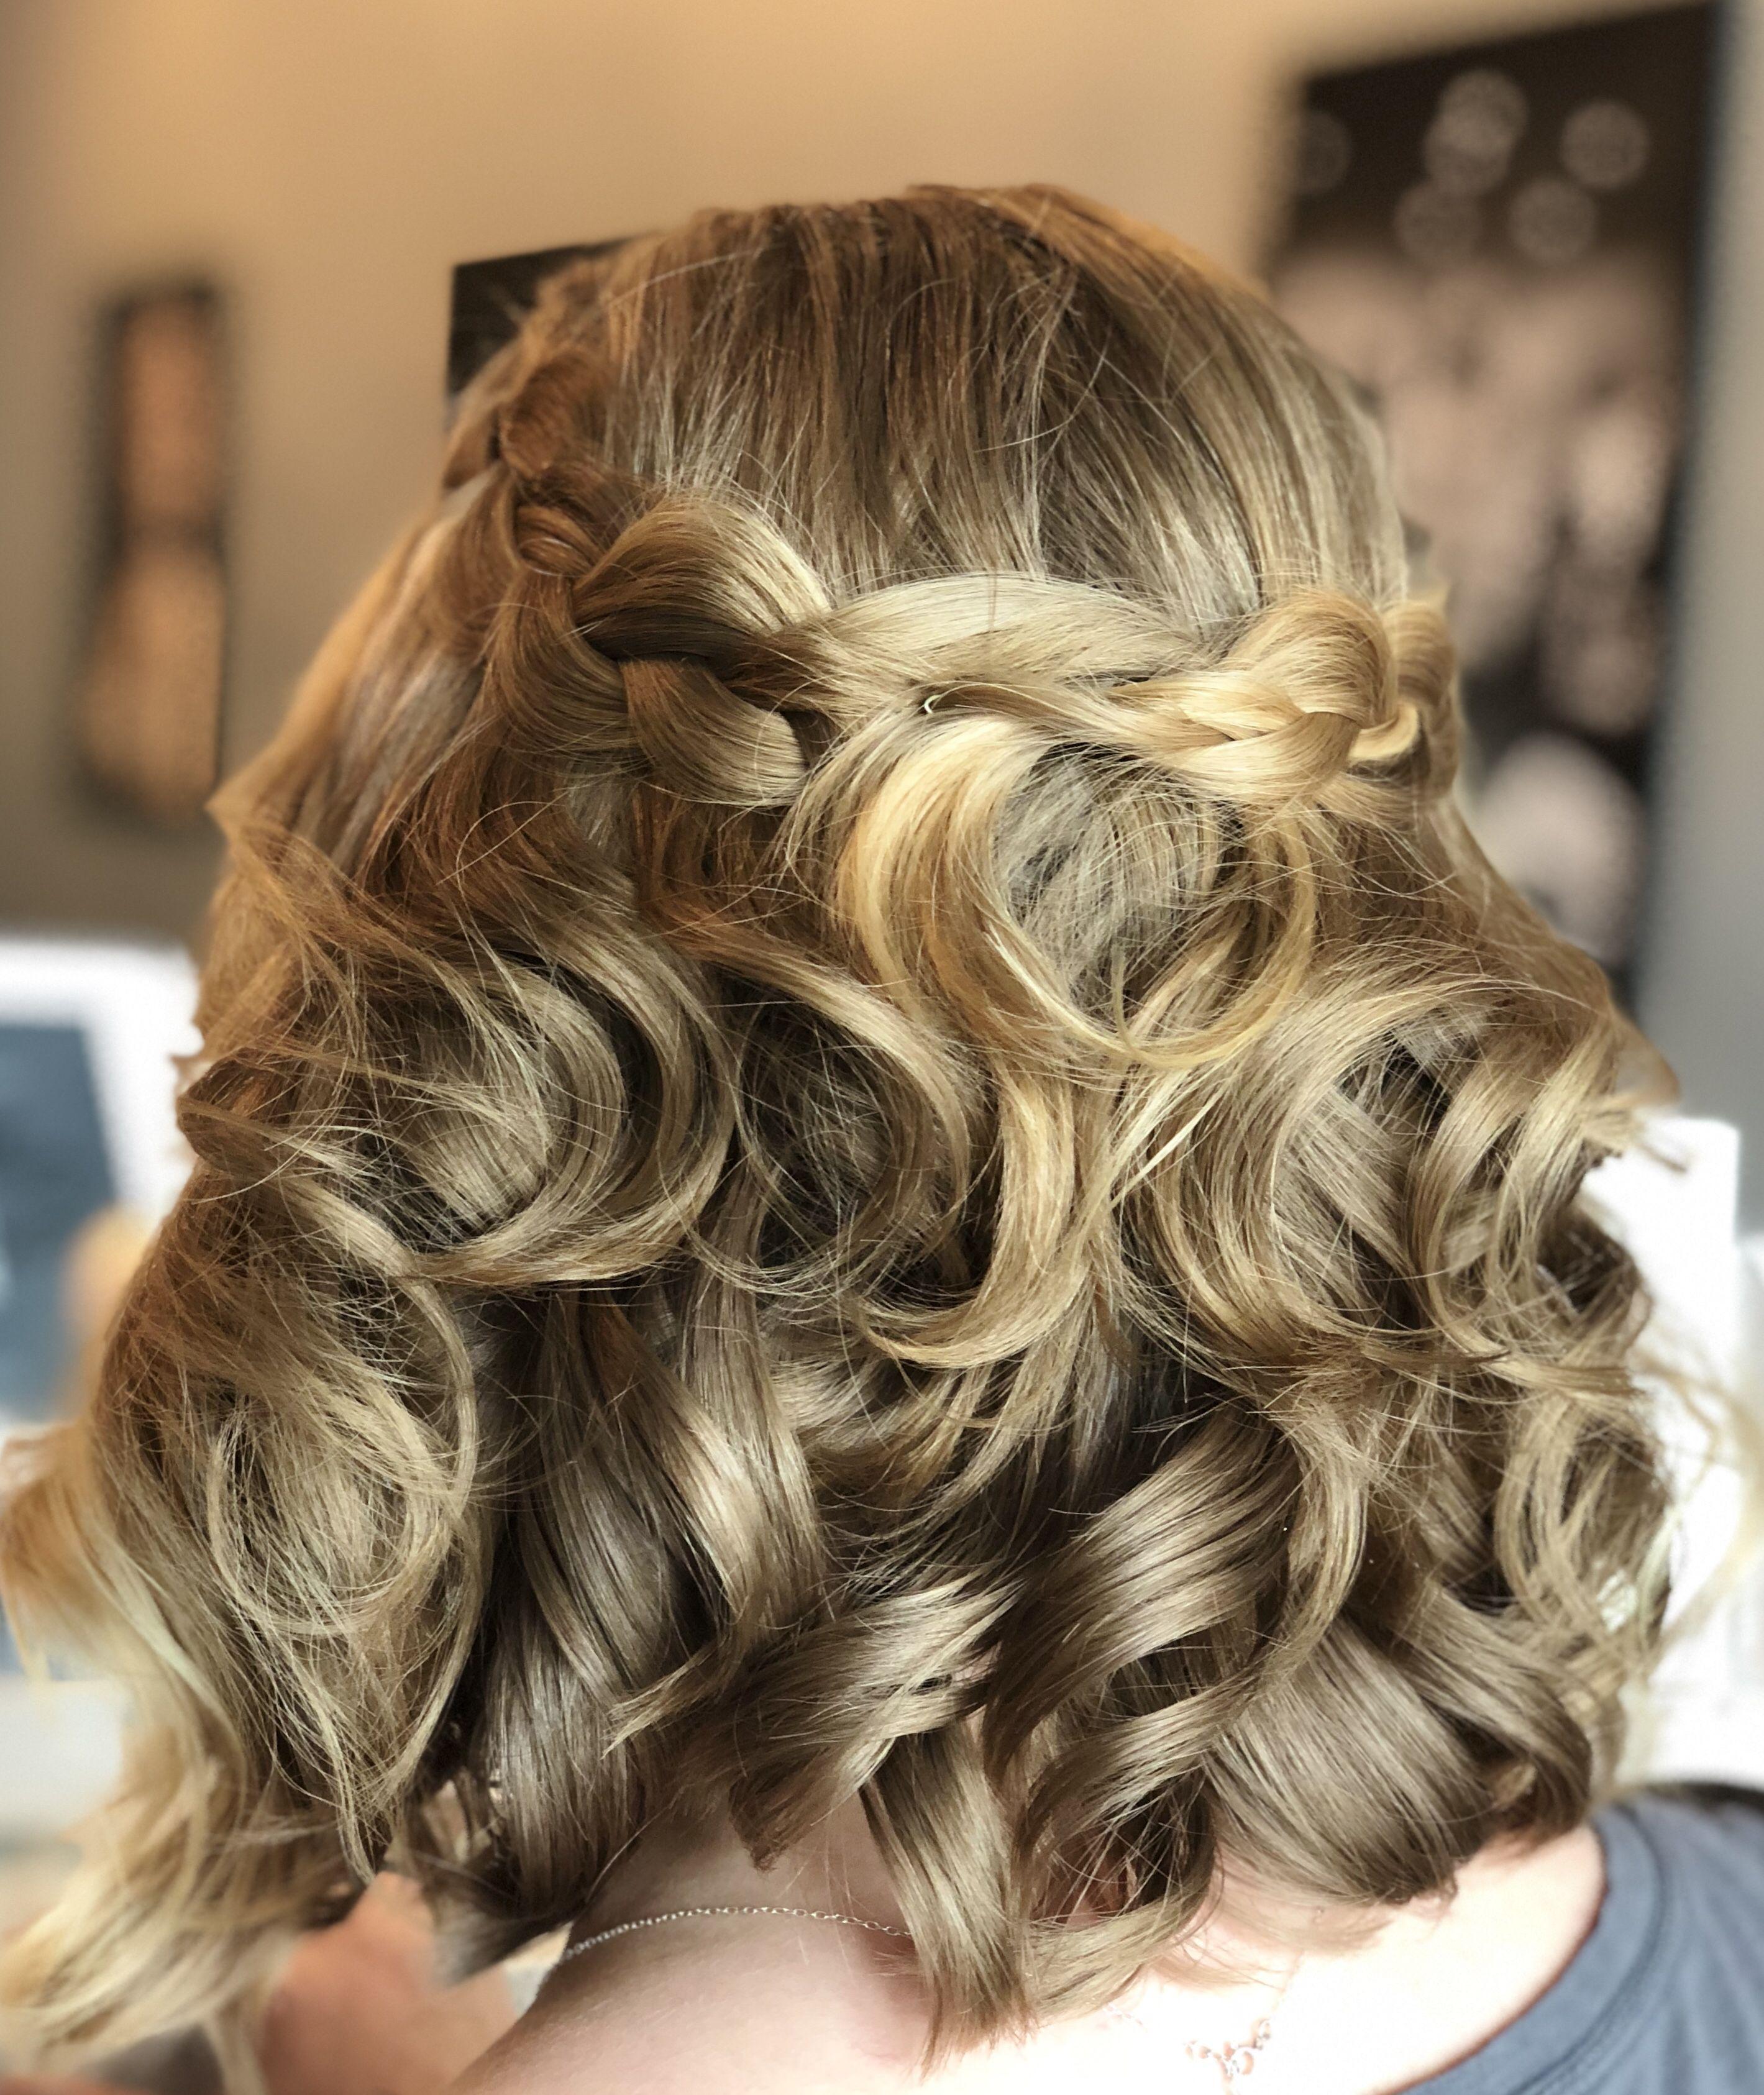 Bella Bombshells | Prom hairstyles for short hair, Braided ...